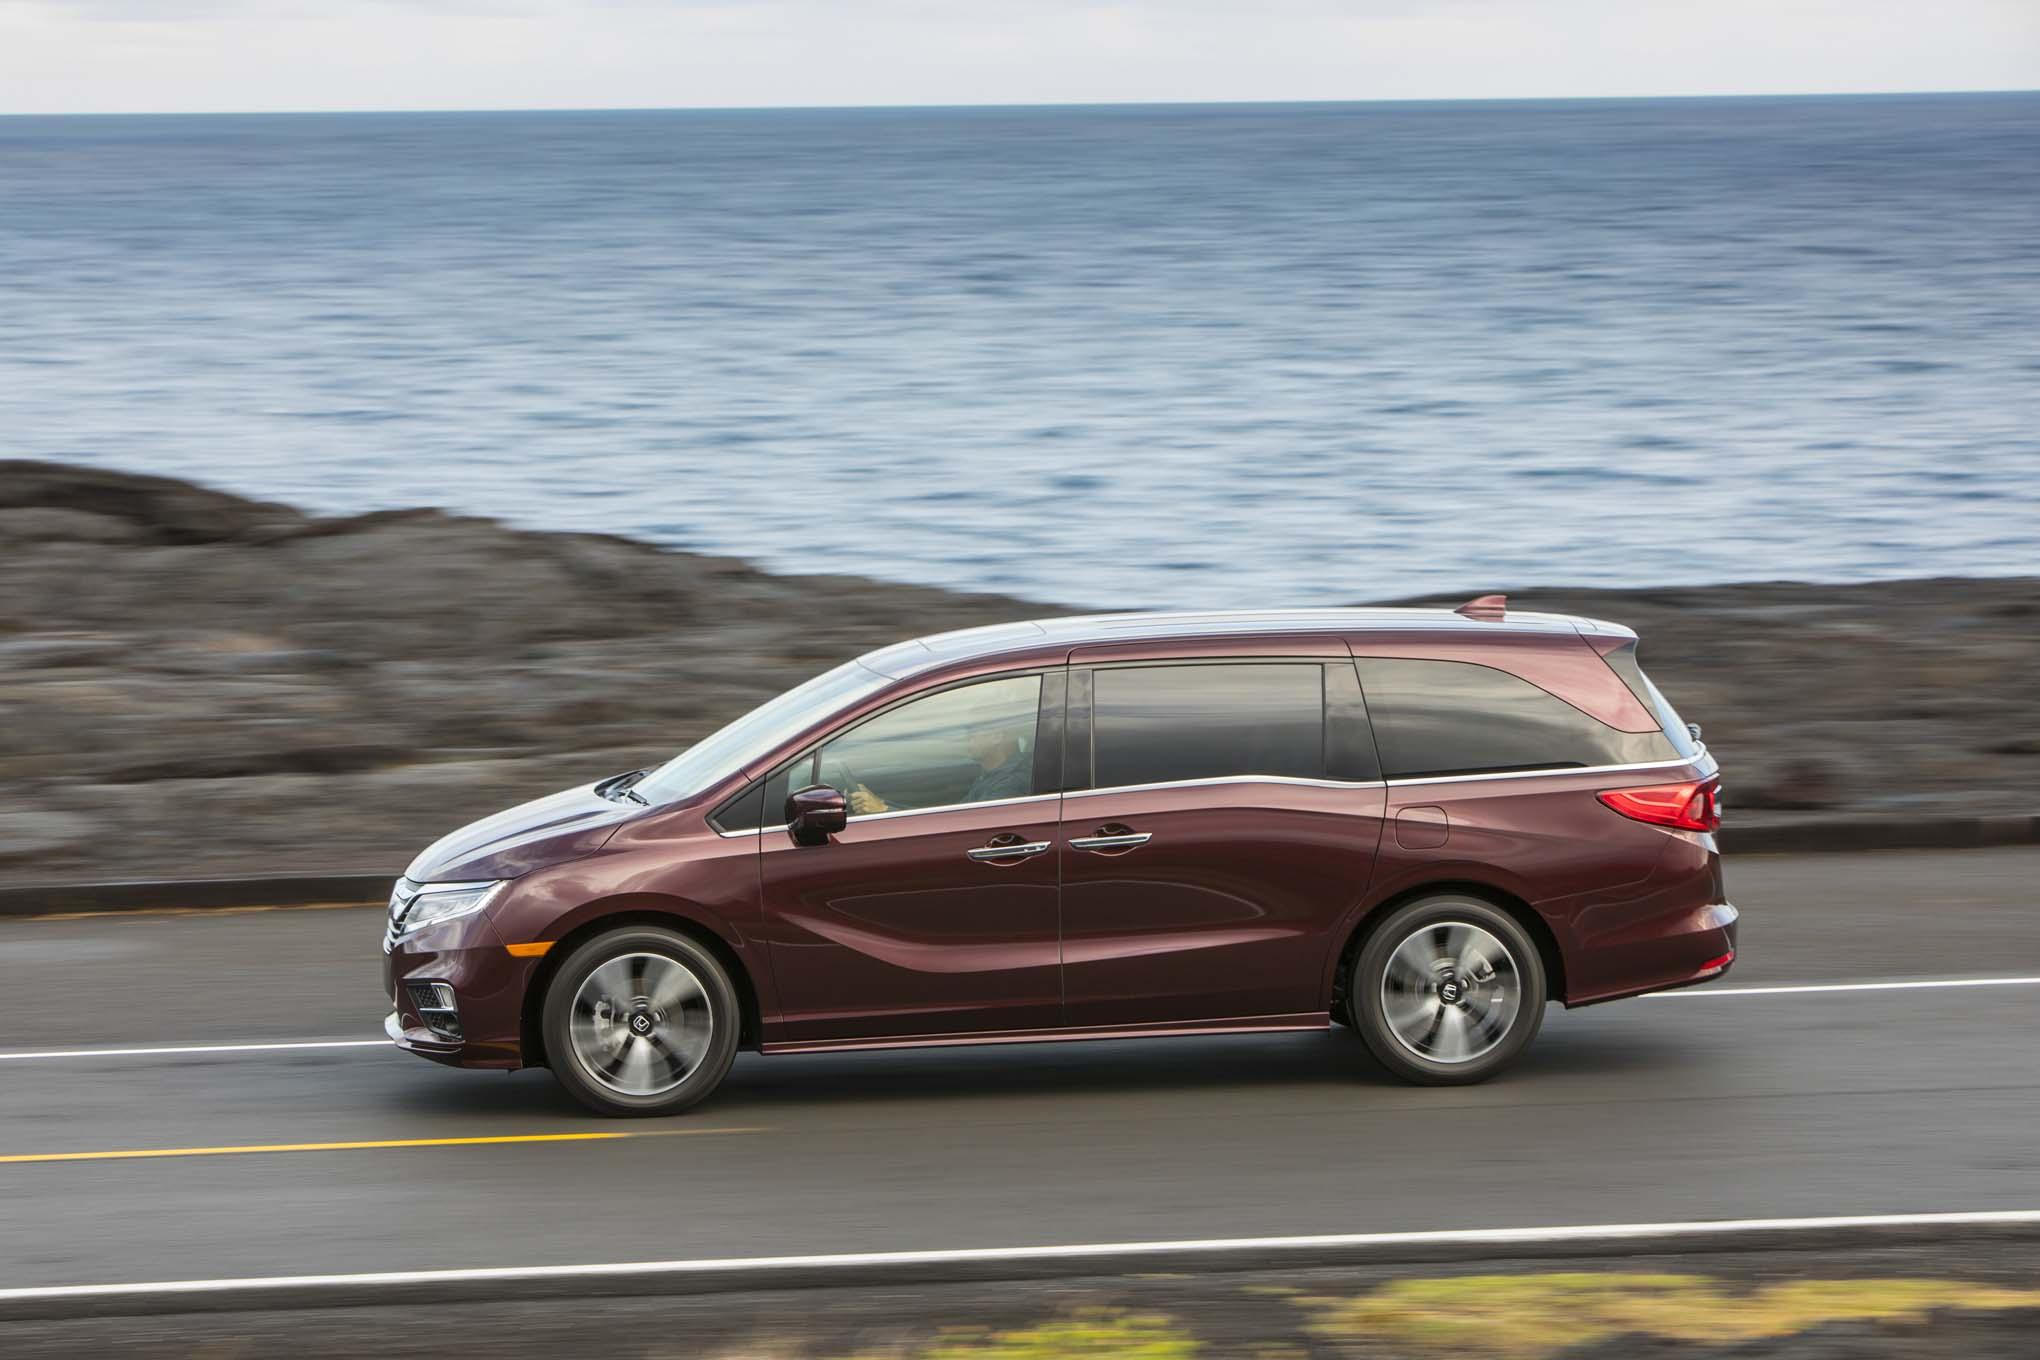 2018 Honda Odyssey Side In Motion 02